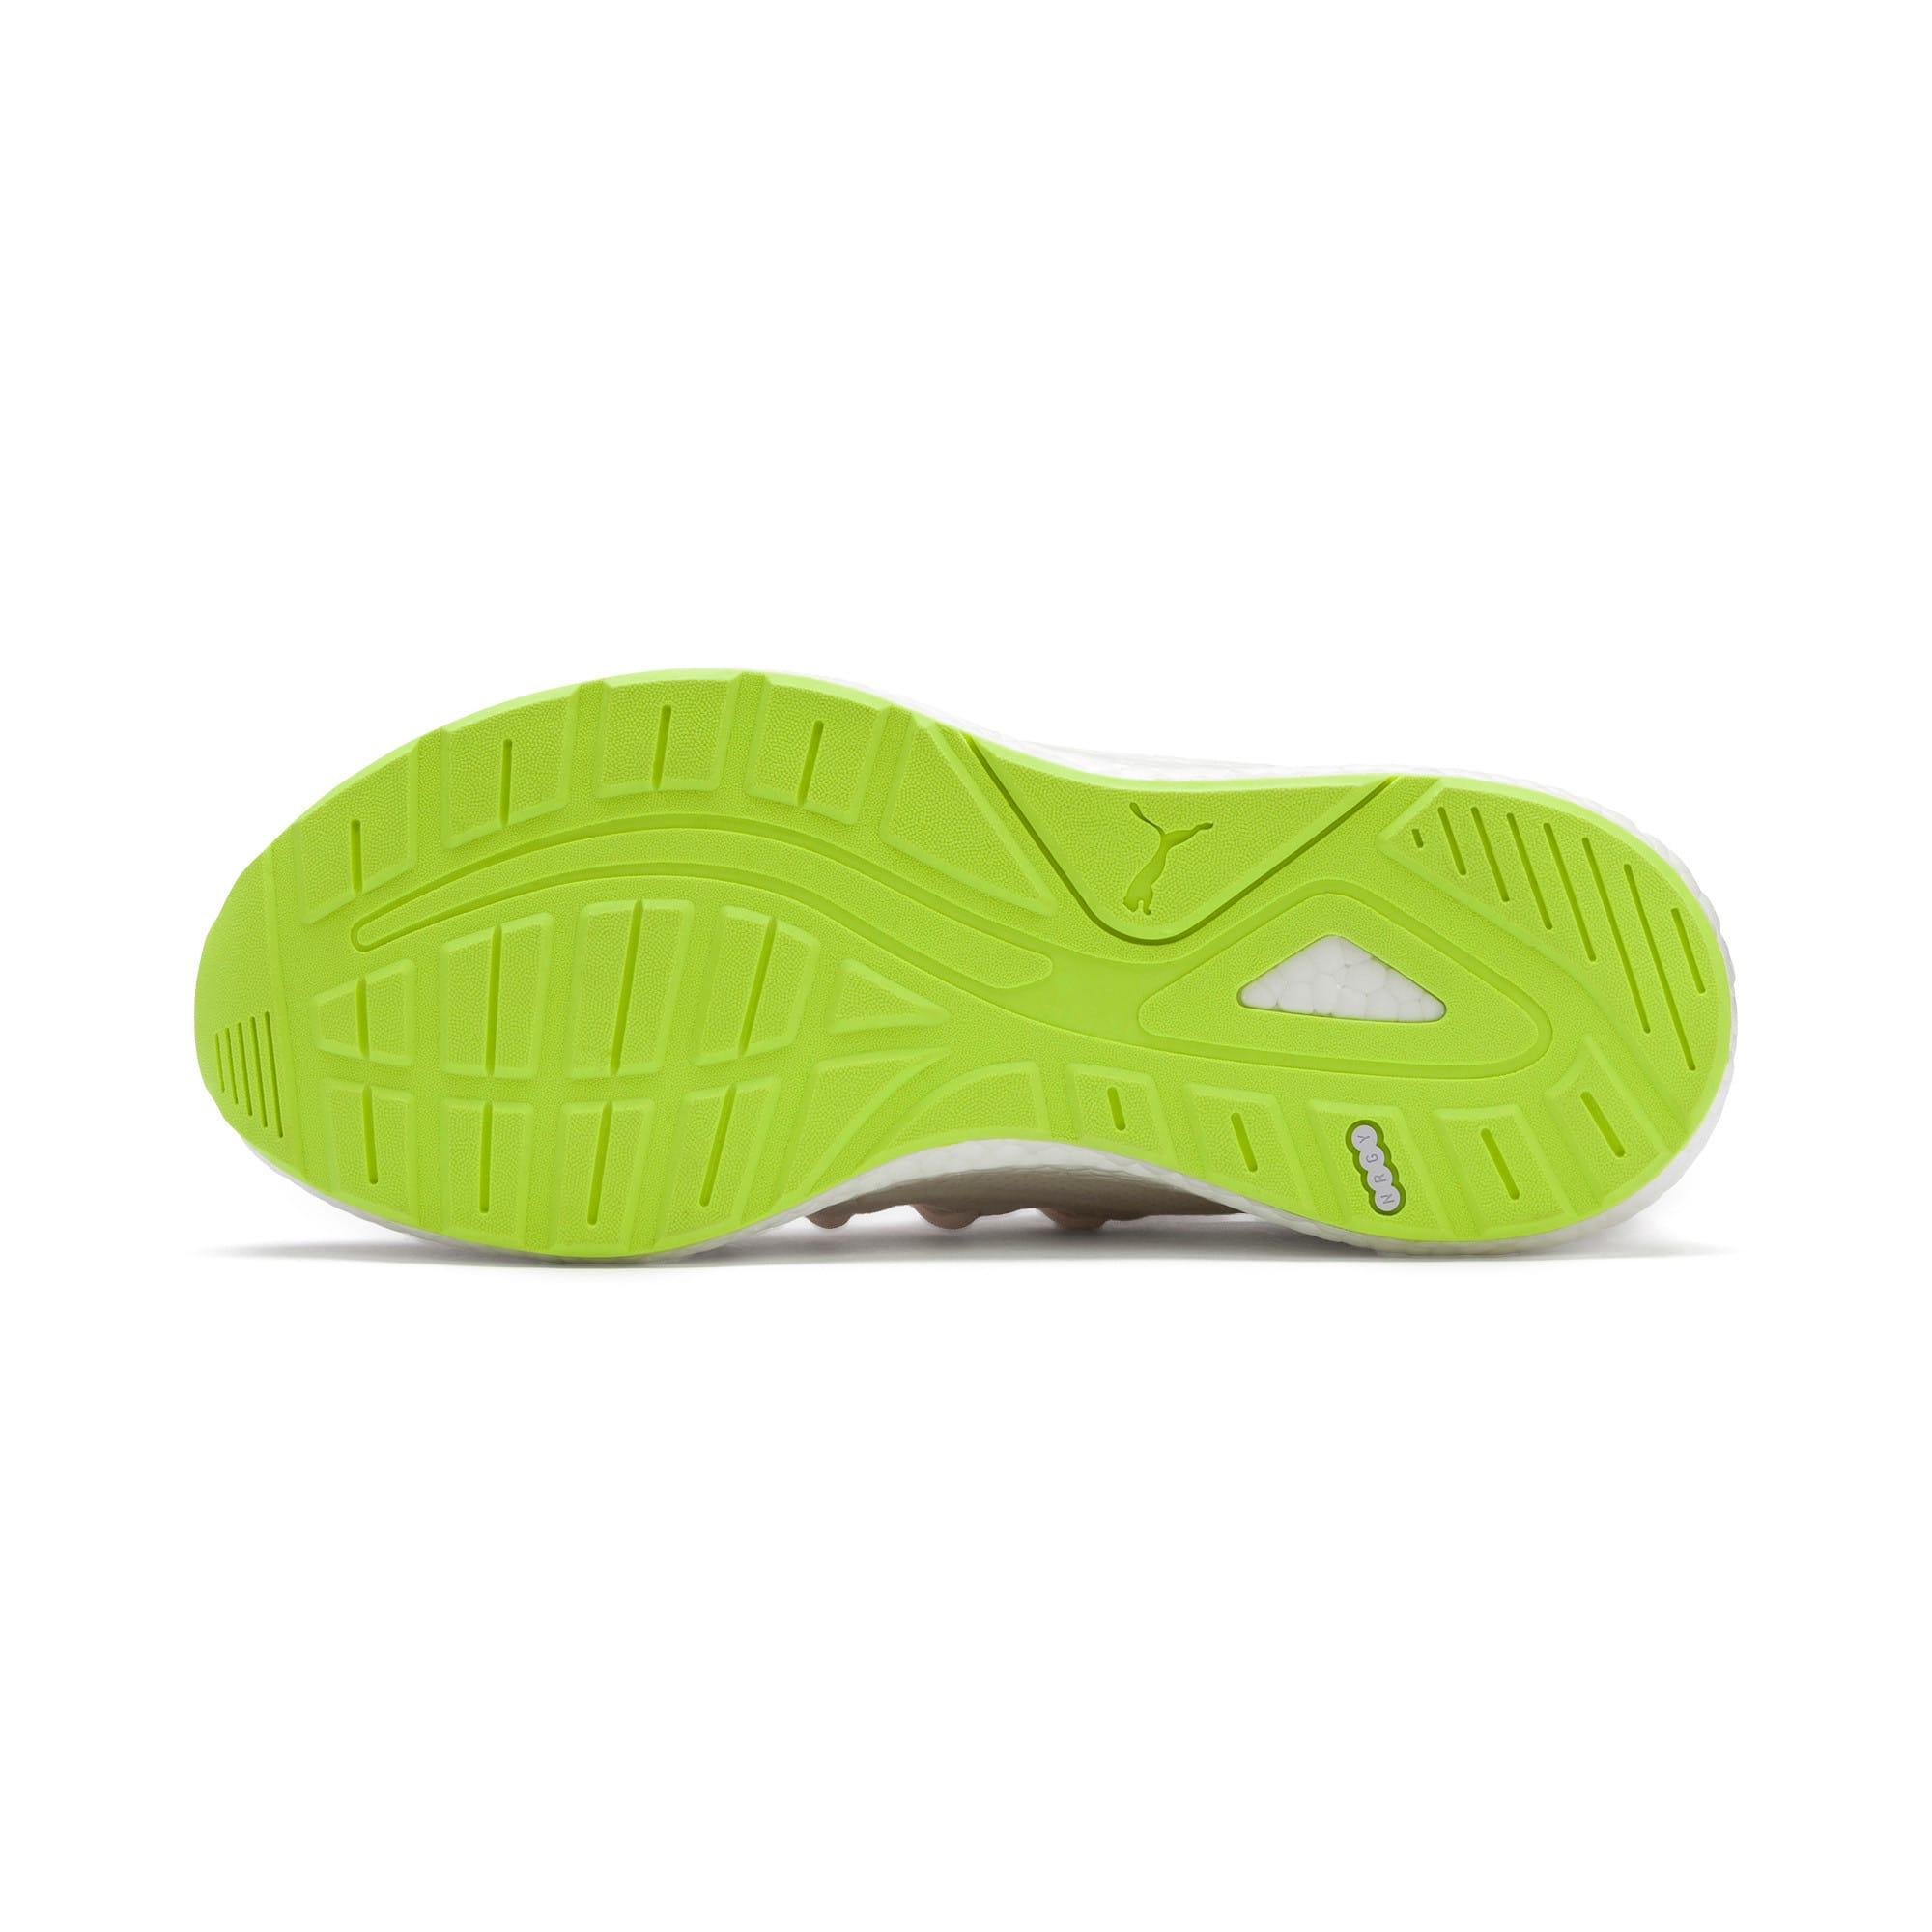 Thumbnail 5 of NRGY Neko Shift Women's Running Shoes, Pastel Parchment, medium